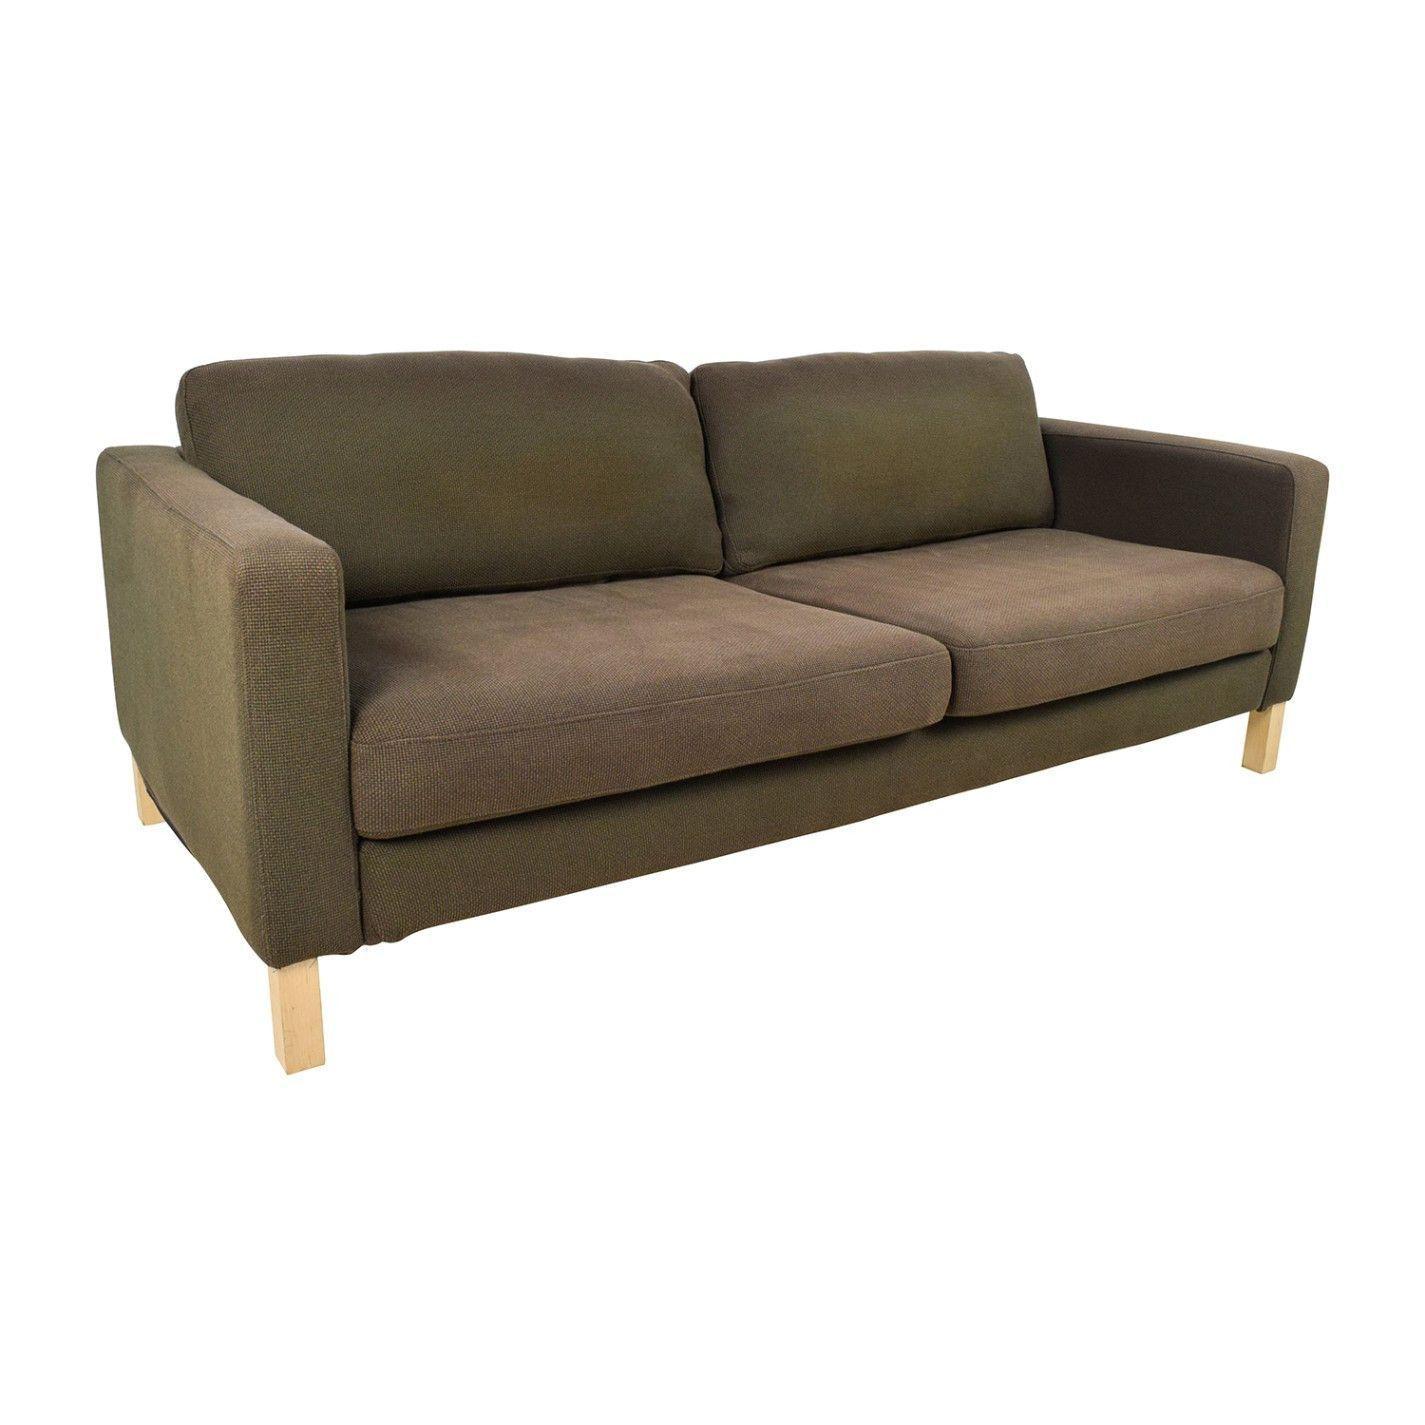 35m Ikea Inkl Links Mit Oder Recamiere Rechts Schlaffunktion Schlafsofa Sofa Tchibo Gartenmobel 2 In 2020 Ikea Sofa Ikea Norsborg Sofa Comfortable Sofa Bed